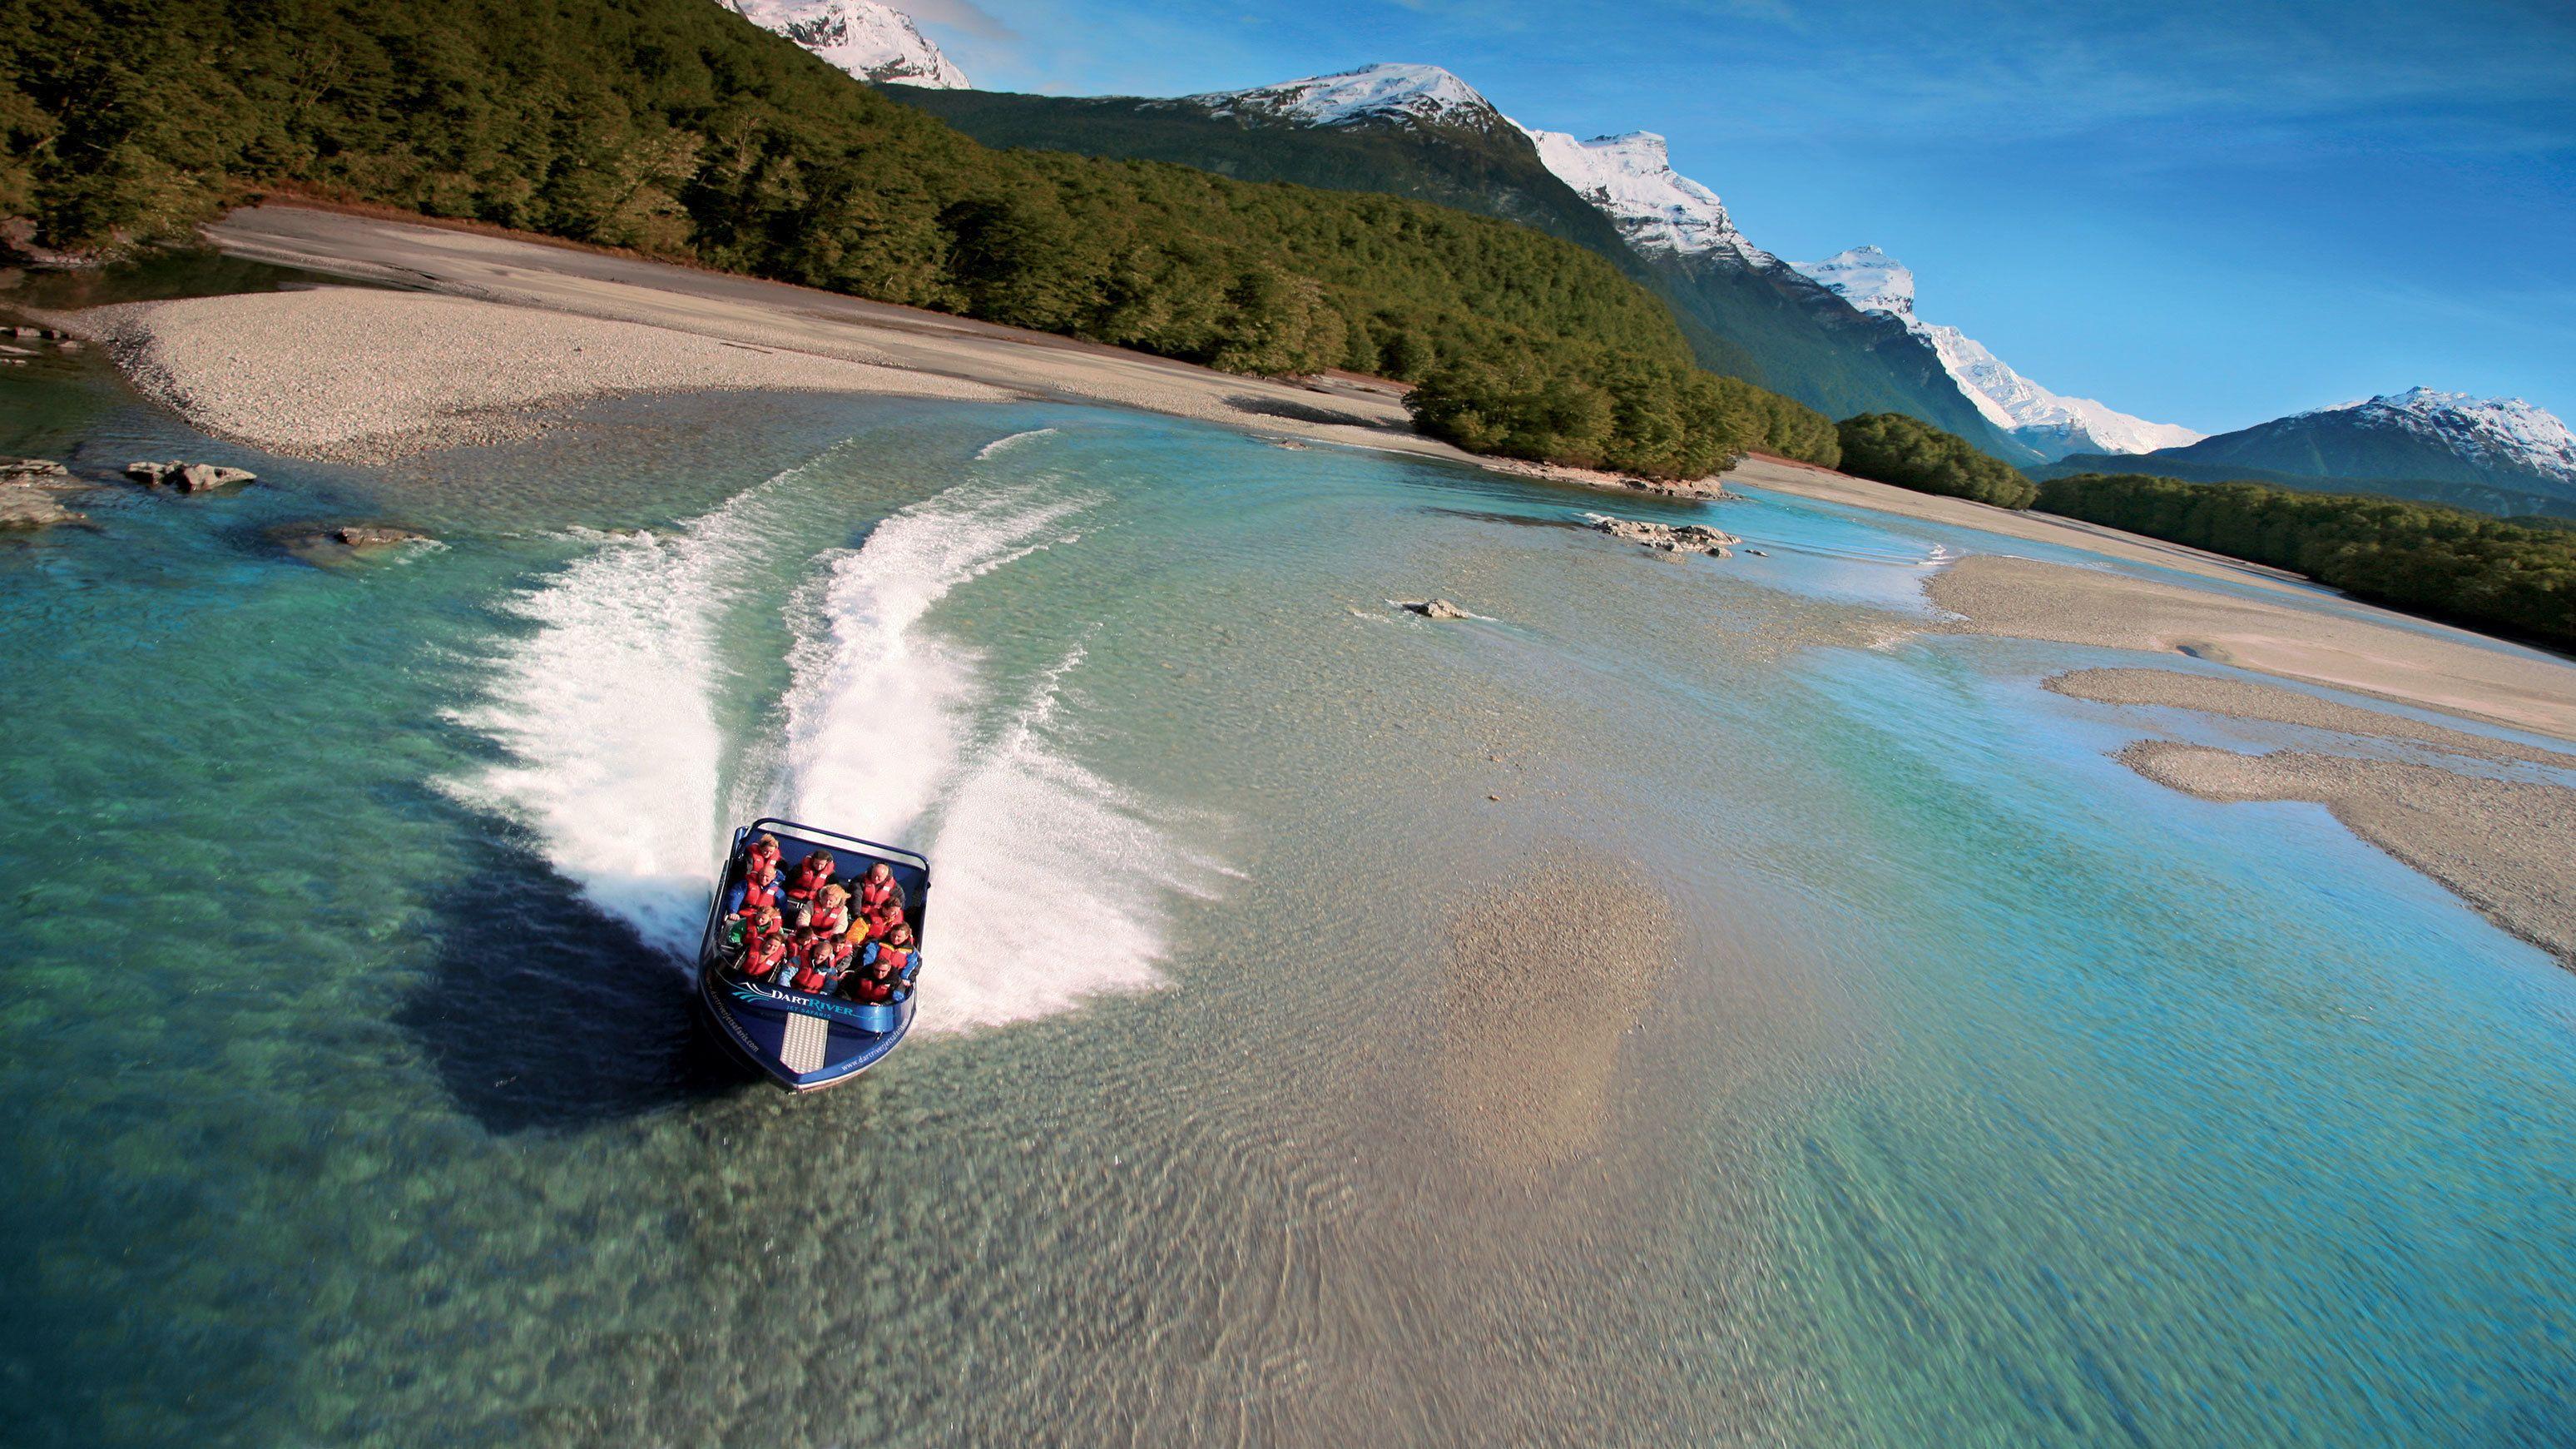 the jet safari boat speeding along the beach in New Zealand